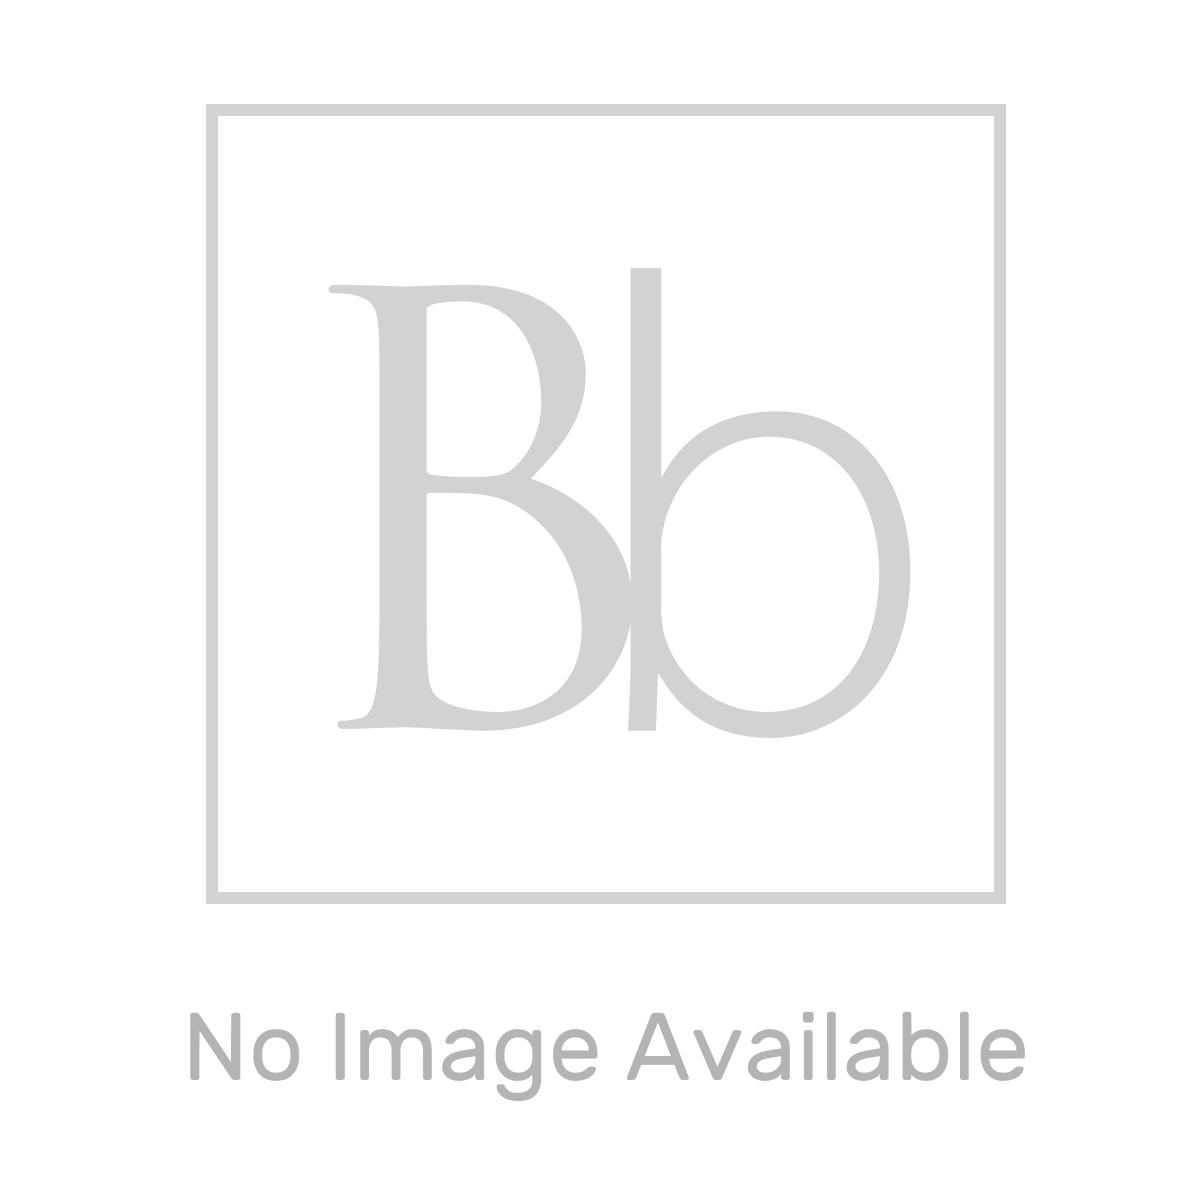 Elation Eko Graphite Gloss Vanity Unit with Groove Drawer 750mm